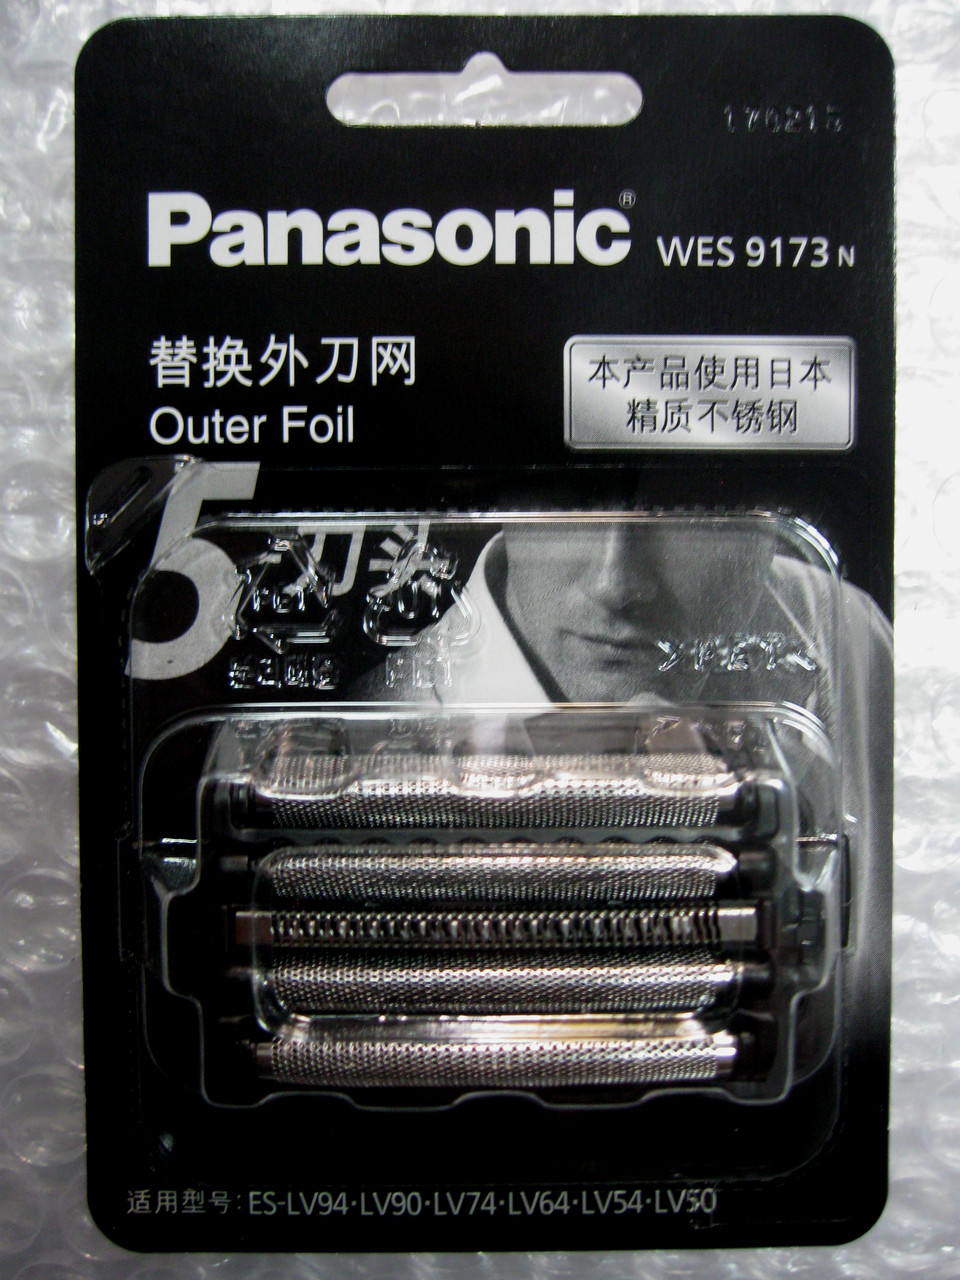 Сетка электробритвы Panasonic ES-LV95 WES9173N